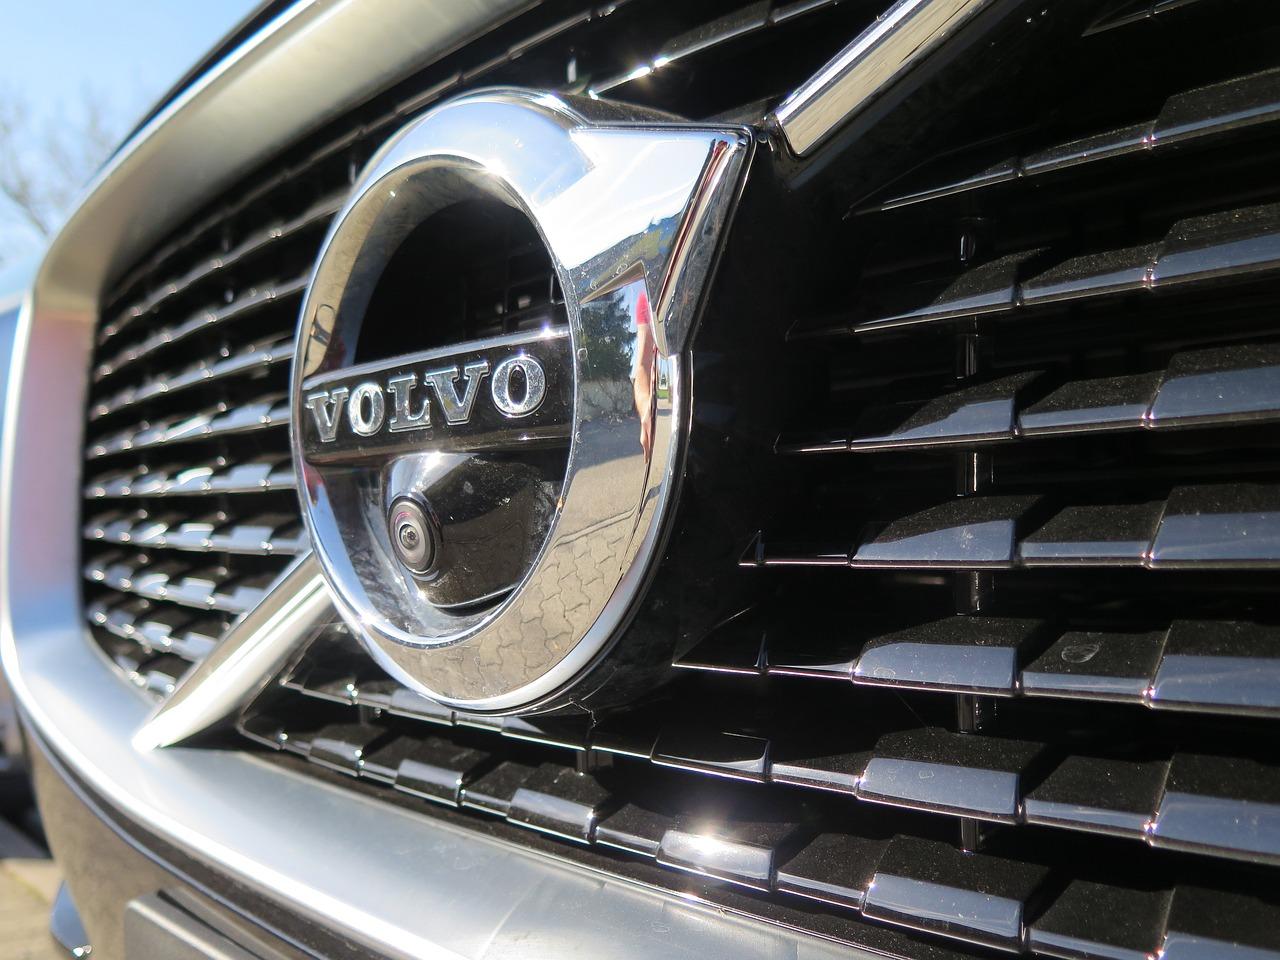 no more car crashes by 2020 u2026 volvo promises a zero accident future